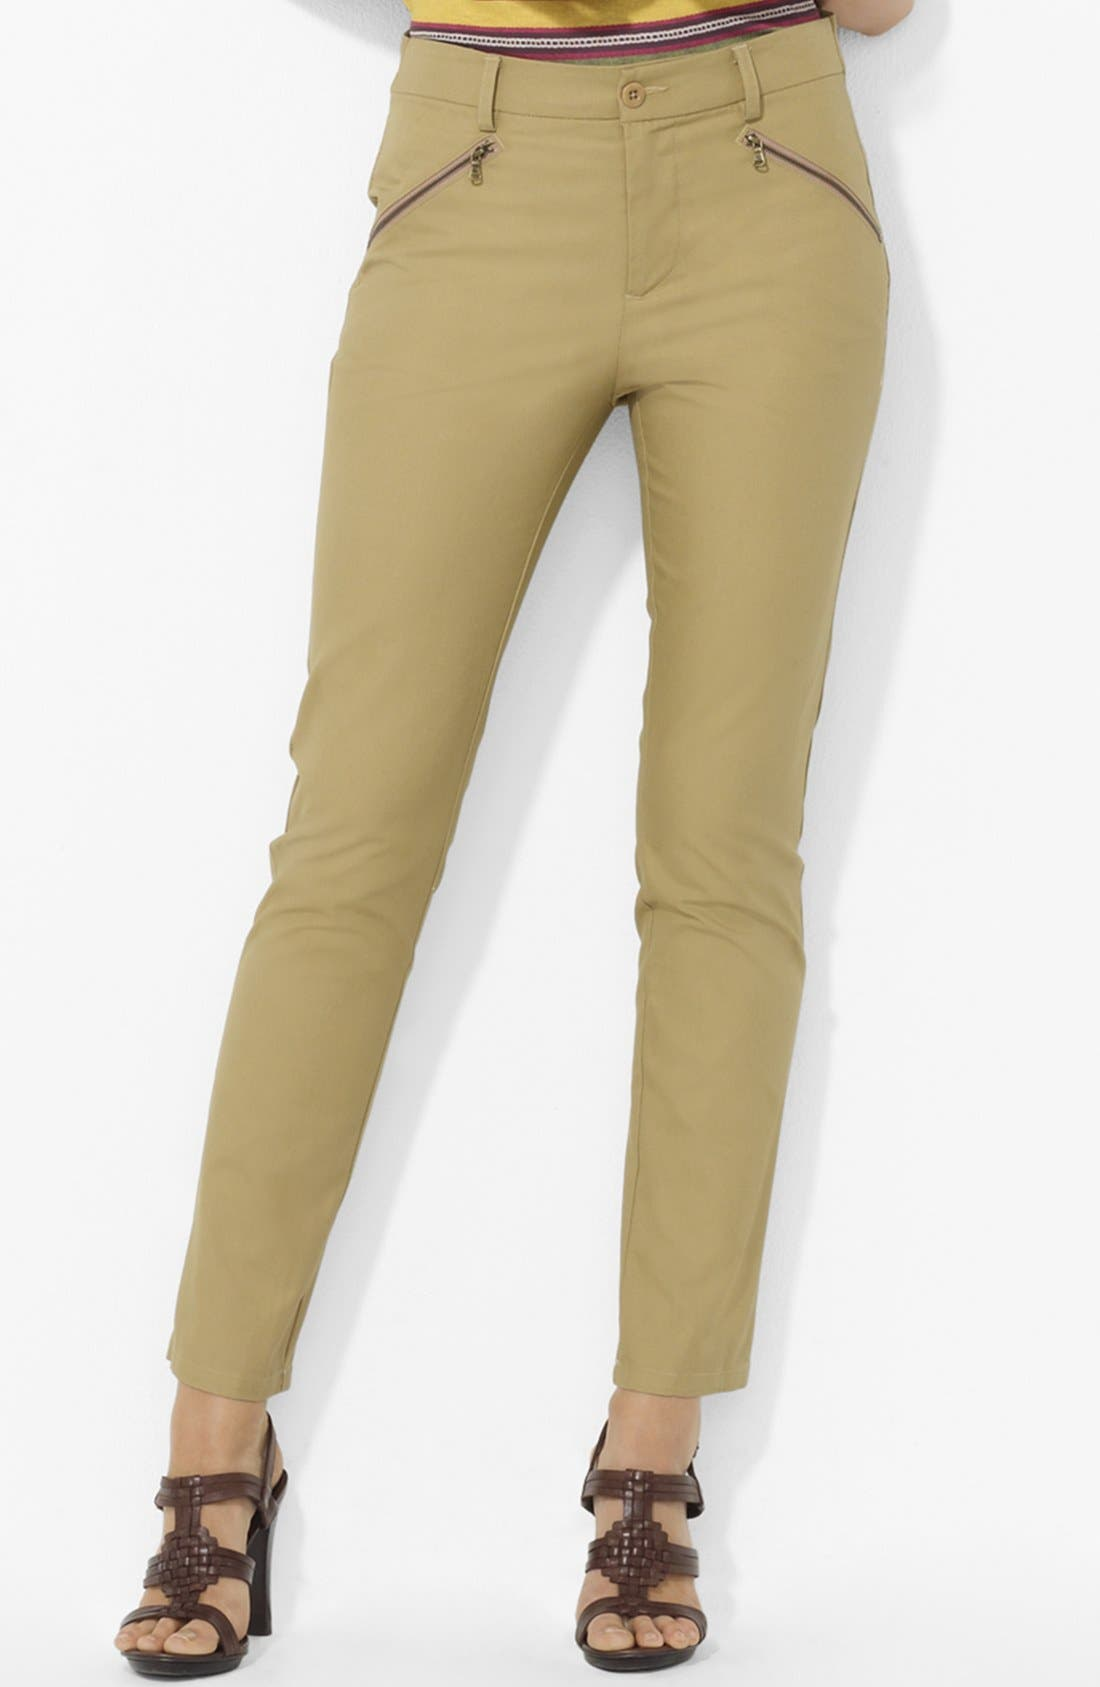 Alternate Image 1 Selected - Lauren Ralph Lauren Slim Twill Pants (Petite)